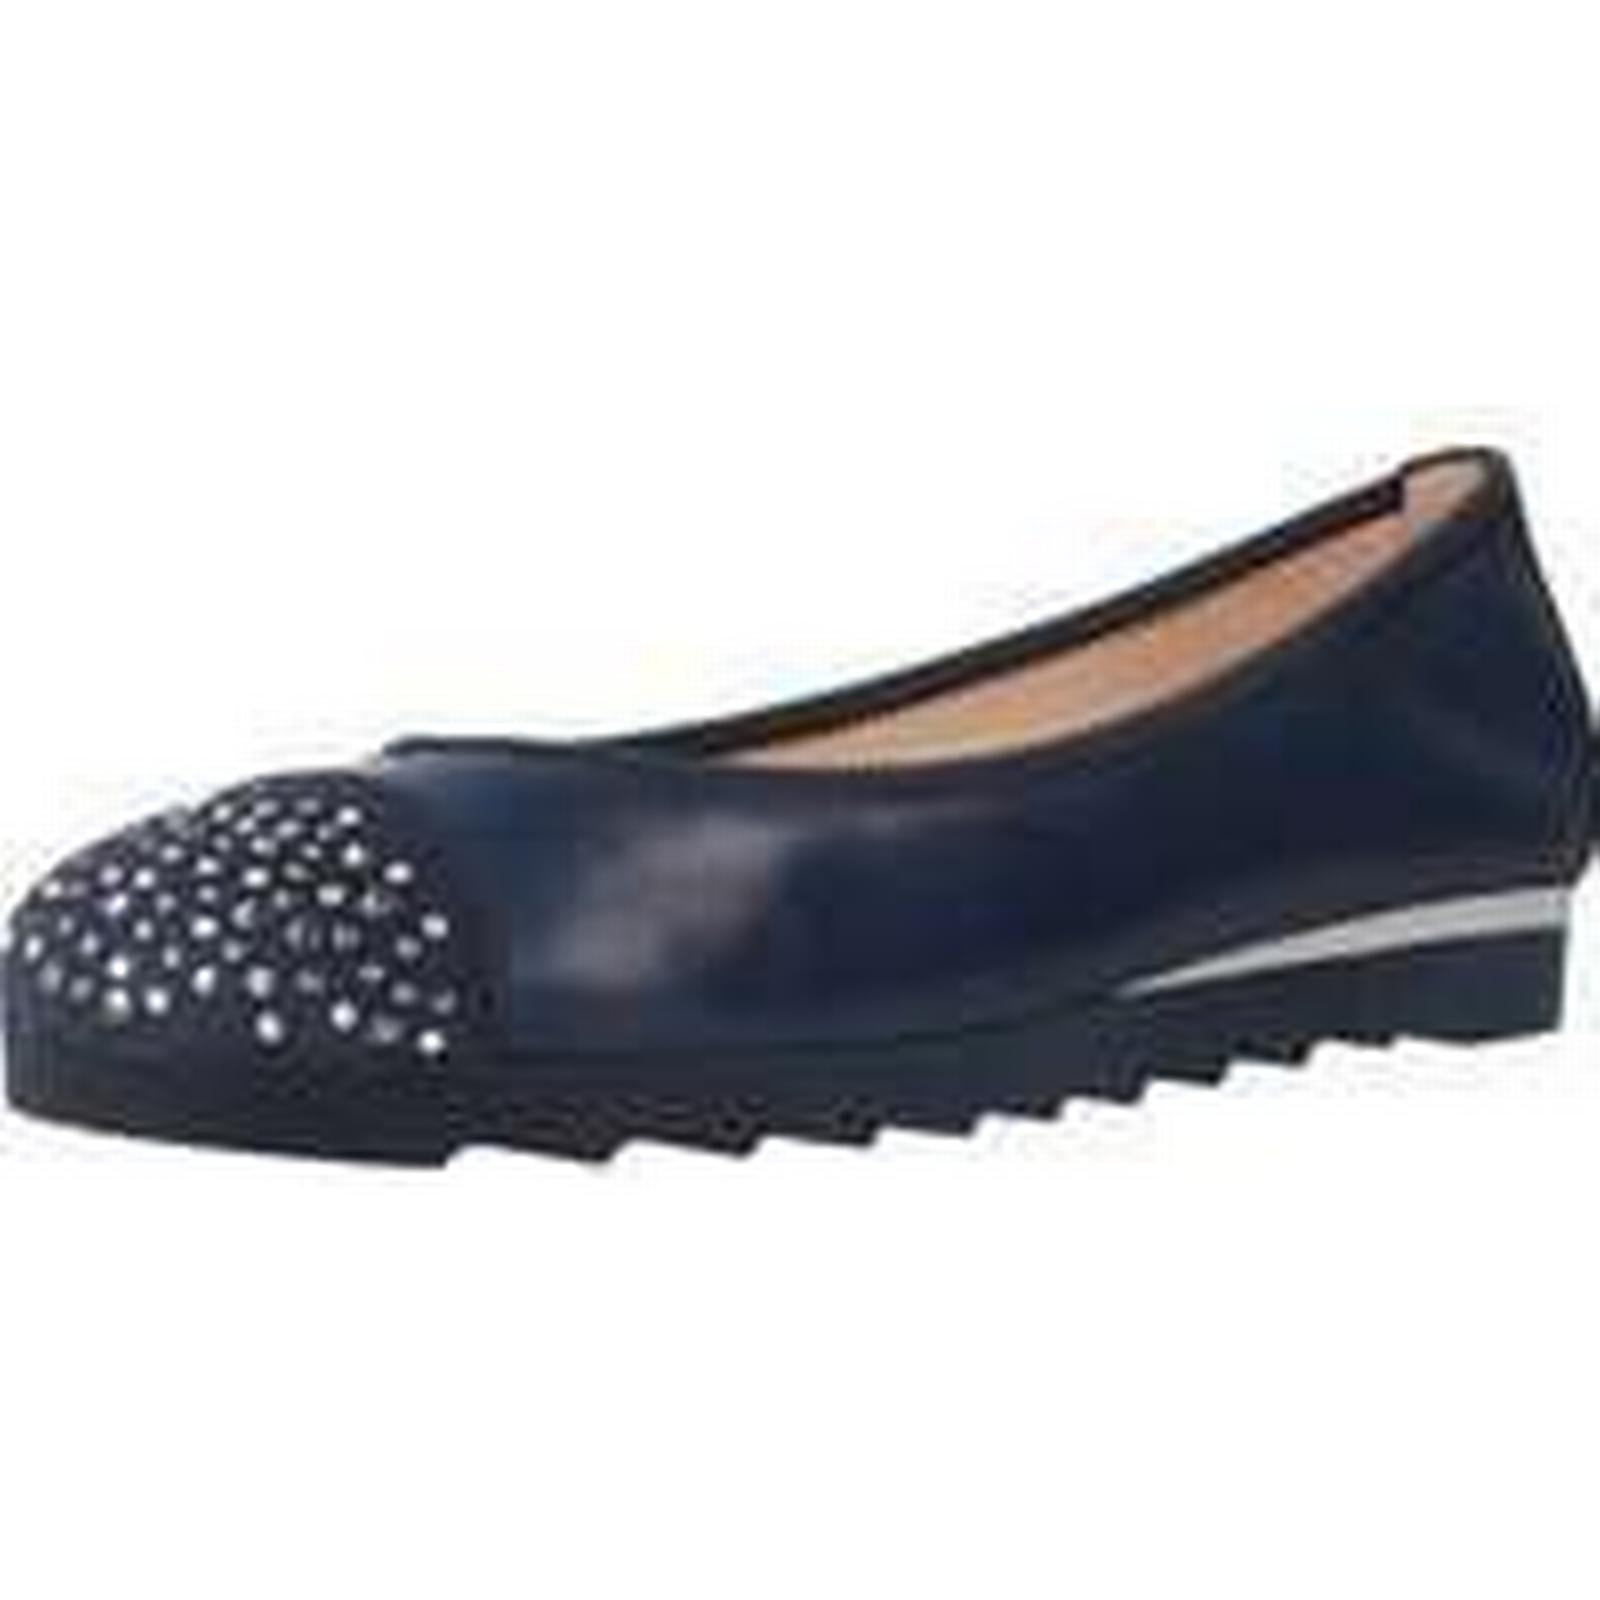 Spartoo.co.uk Hispanitas HV86909 Ballerinas) women's Shoes (Pumps / Ballerinas) HV86909 in Blue 81a084